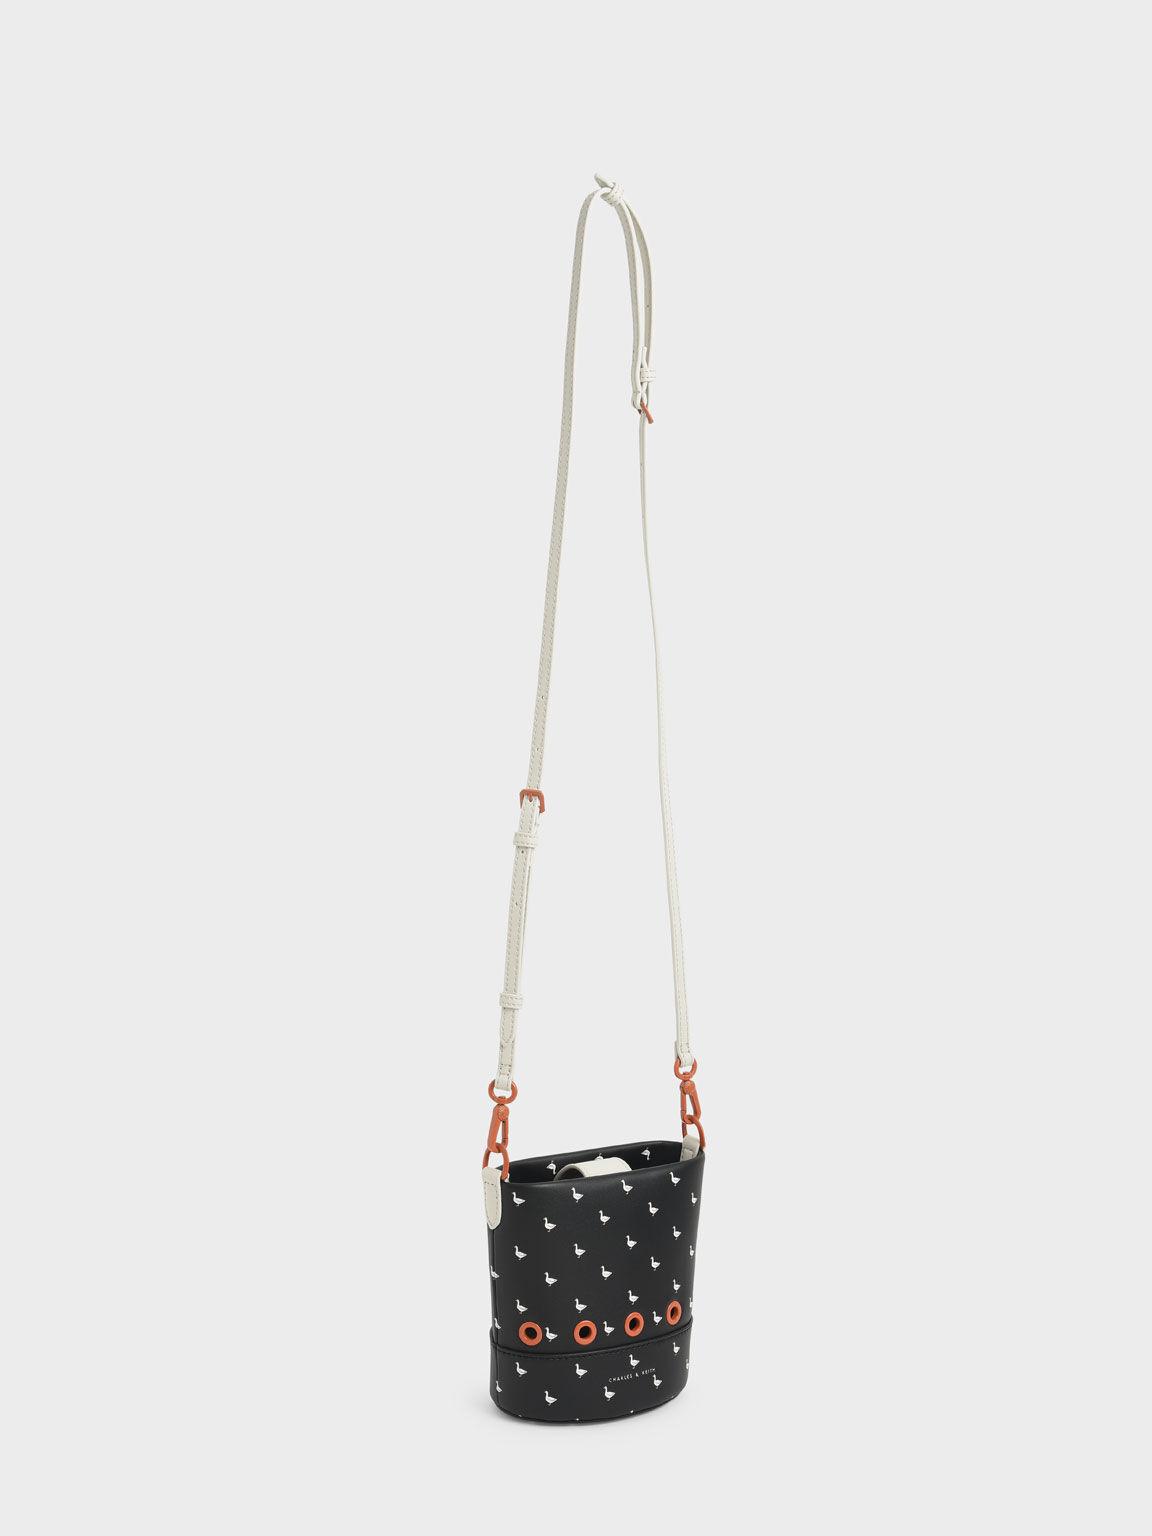 Girls' Printed Bucket Bag, Black Textured, hi-res